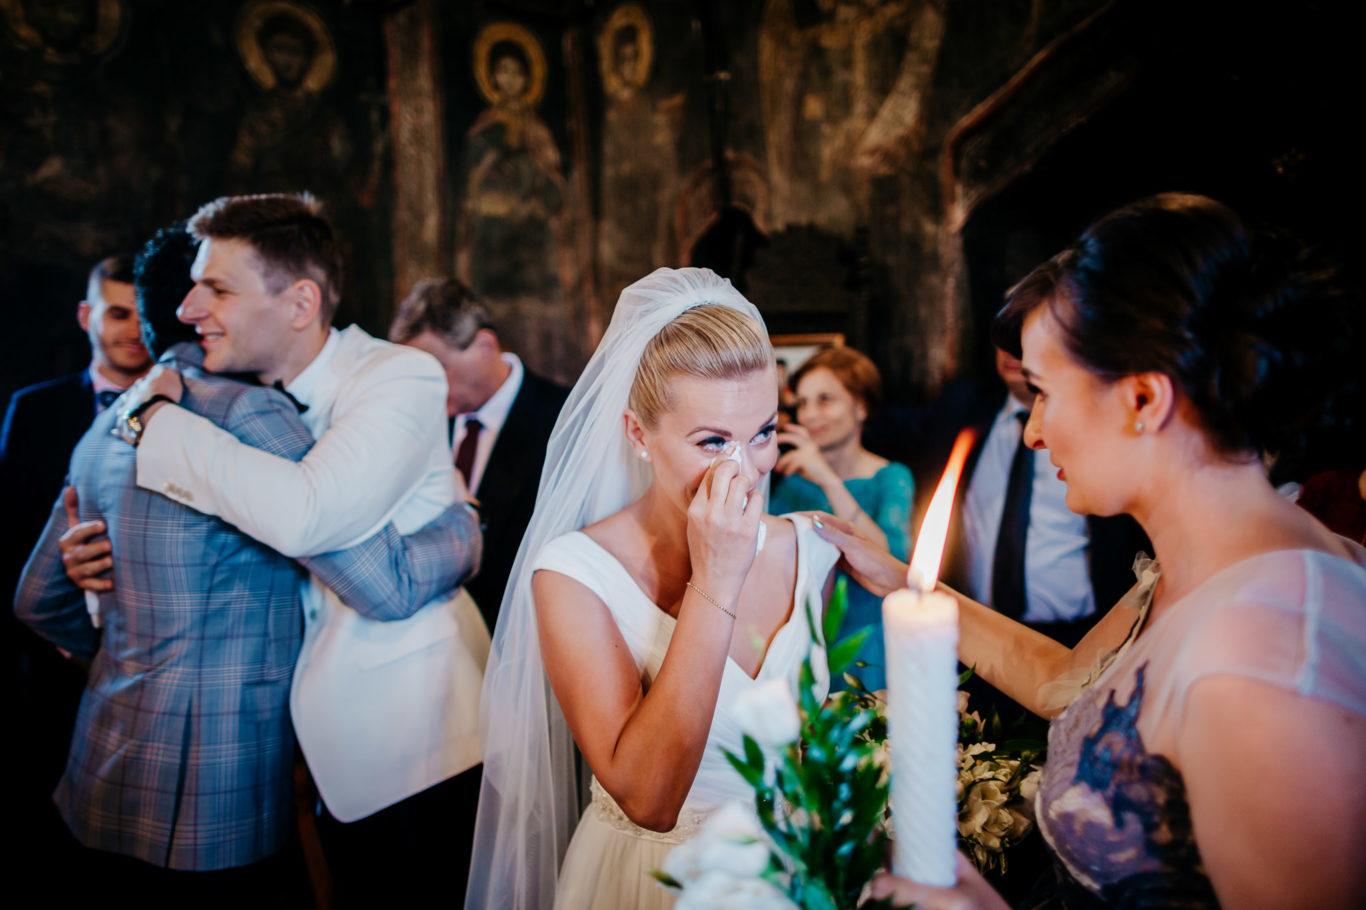 0364-fotoreportaj-nunta-conacul-maldar-cristina-stefan-fotograf-ciprian-dumitrescu-dc1_2541